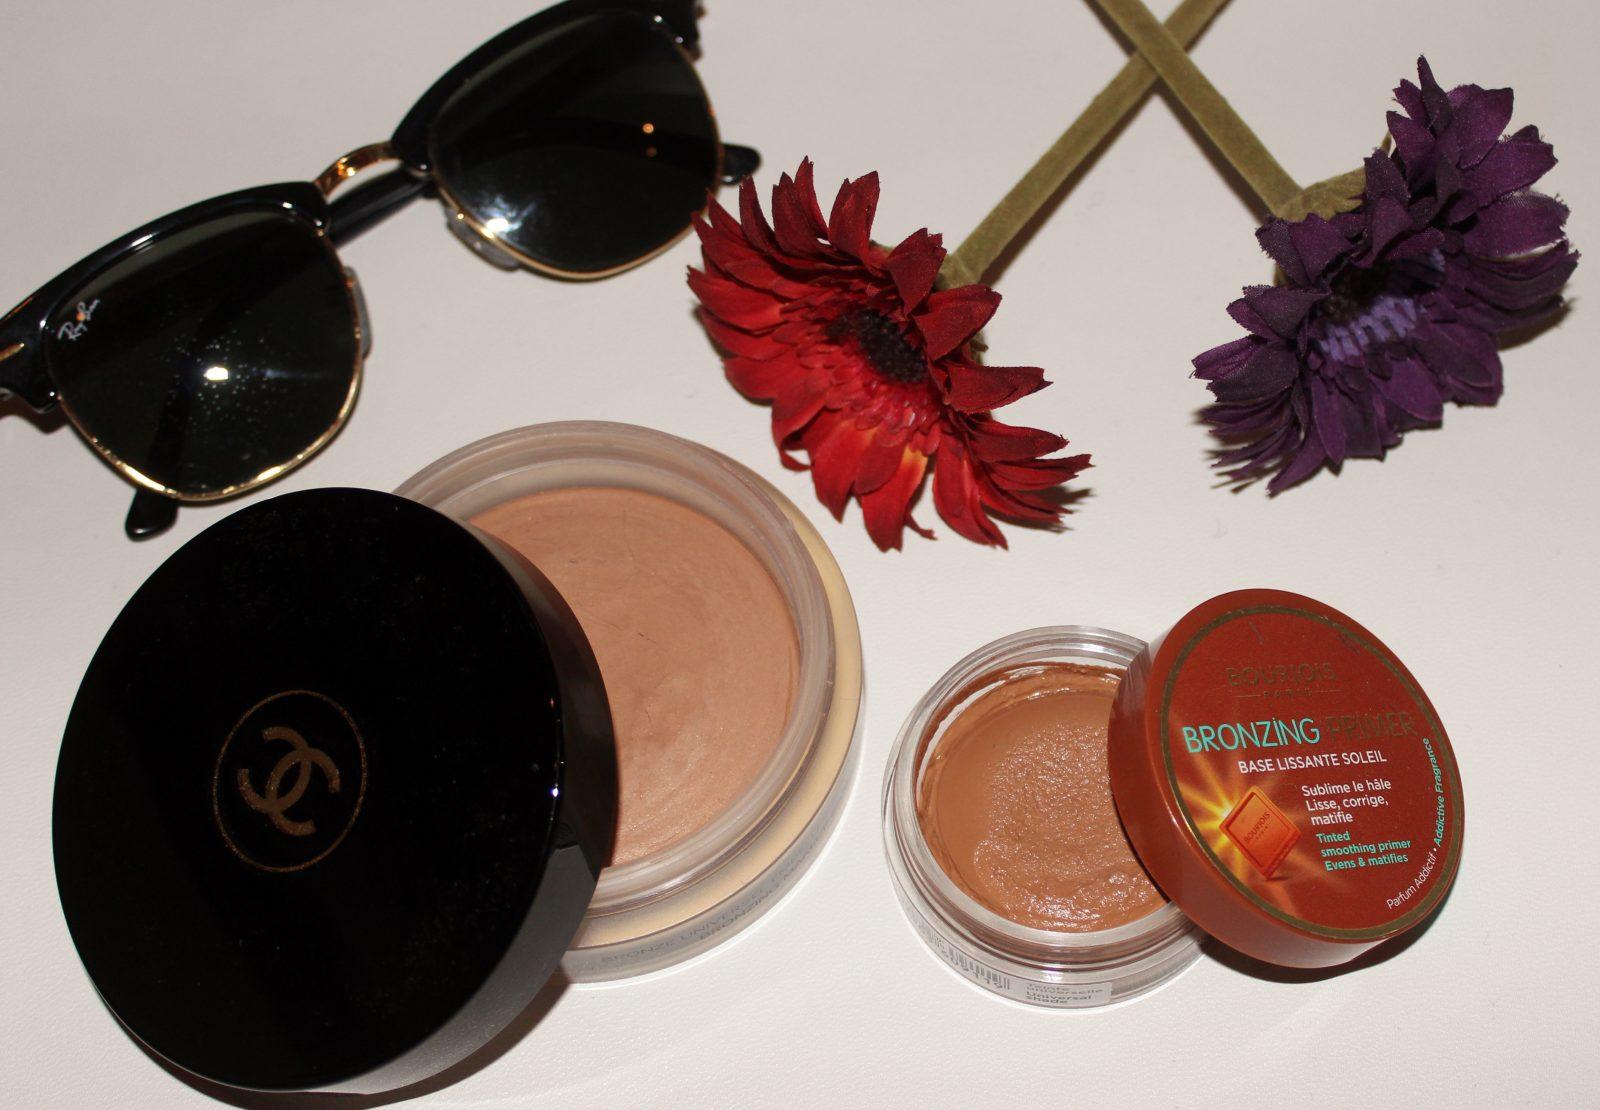 Chanel Soleil Tan De Chanel Bourjois Bronzing Primer